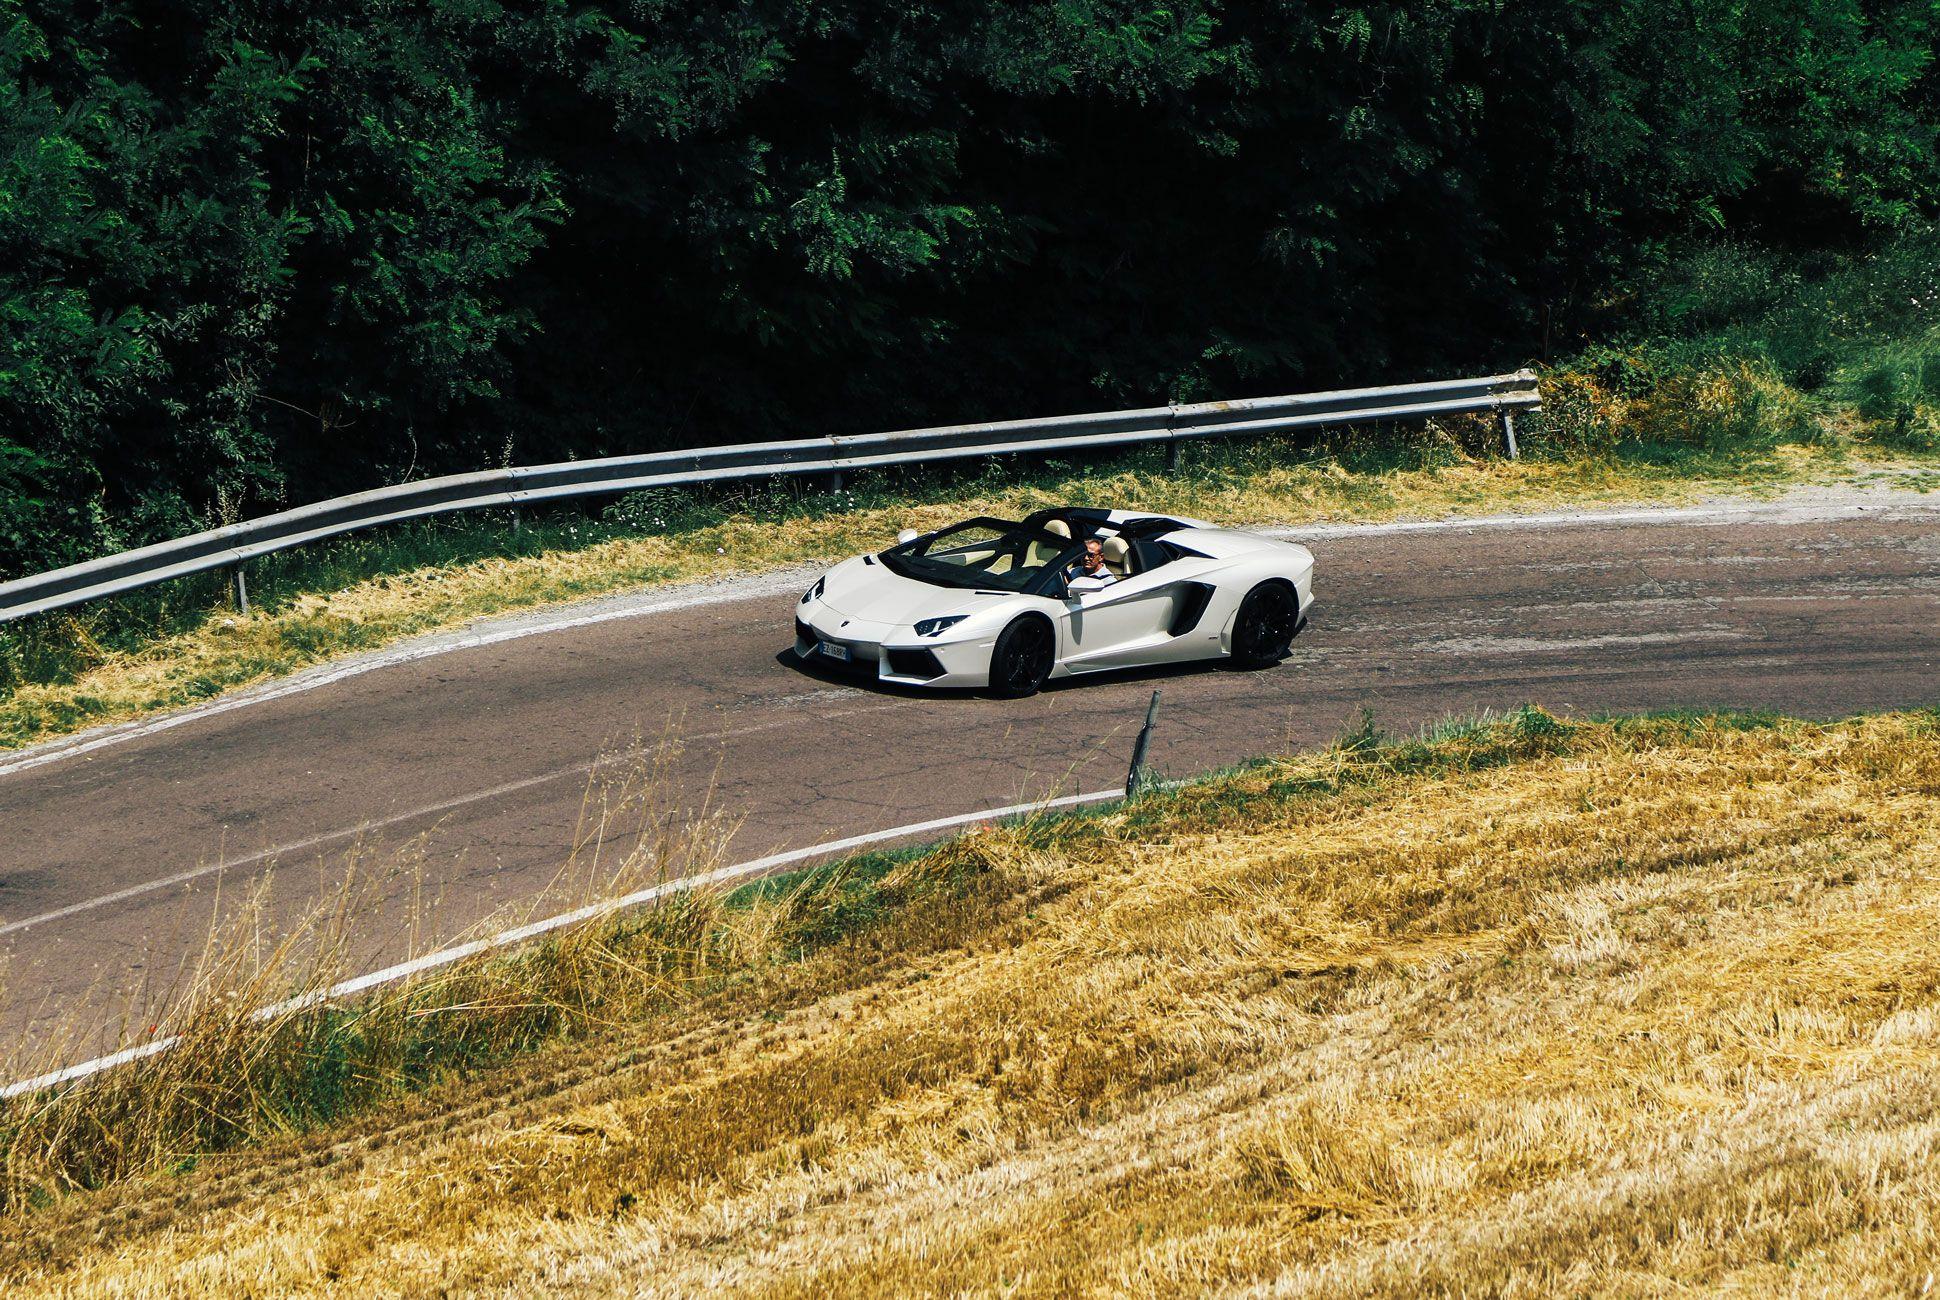 Lamborghini-Aventador-Roadster-Gear-Patrol-Ambiance